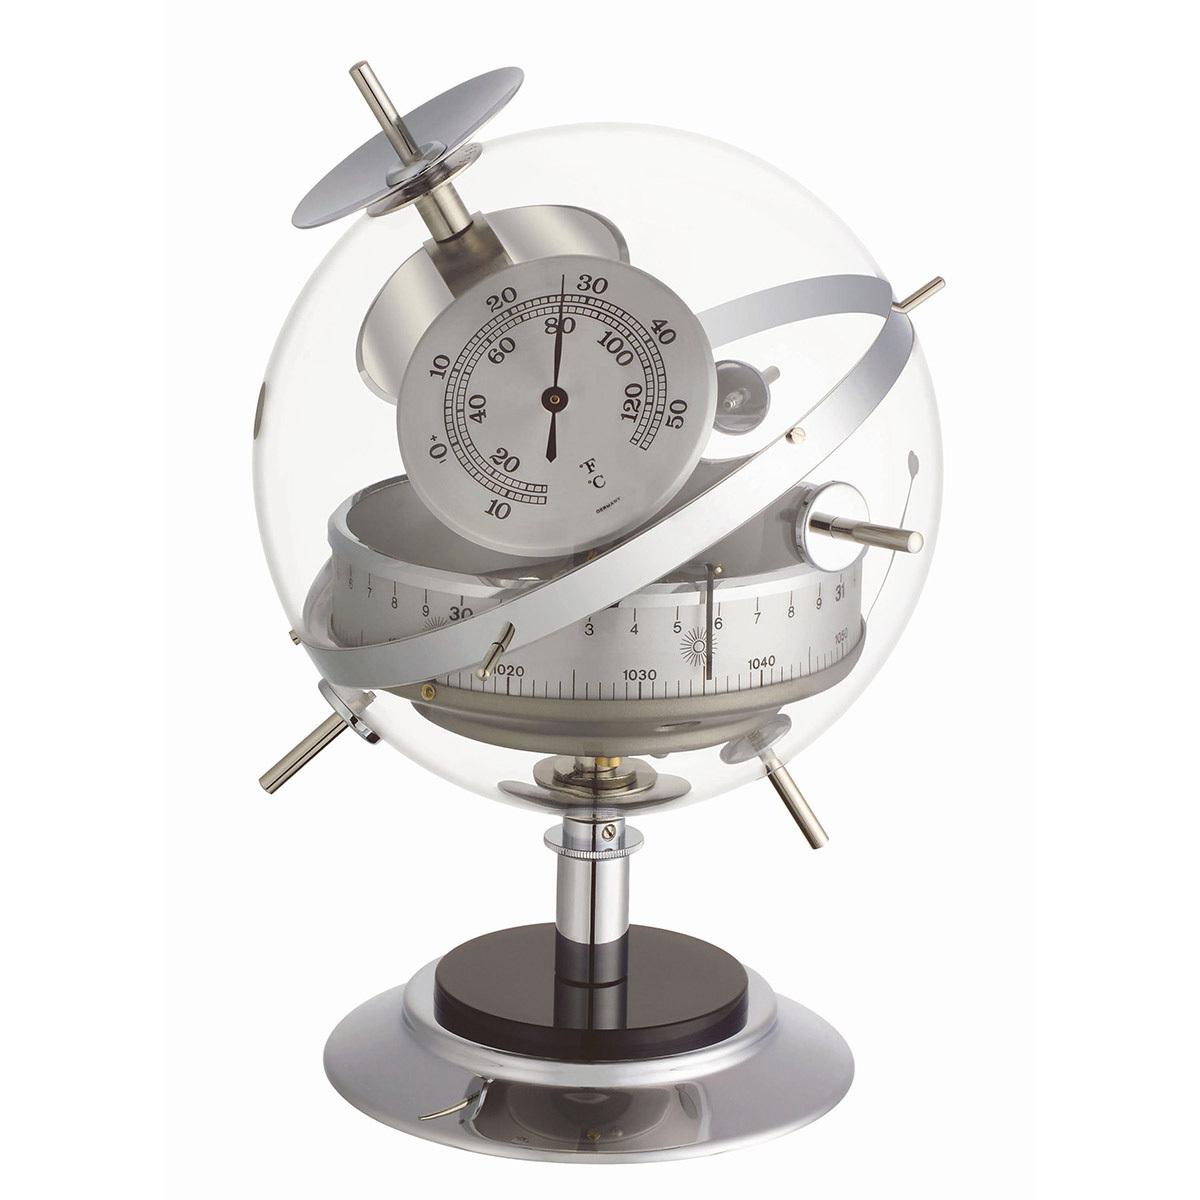 20-2047-54-b-analoge-wetterstation-sputnik-1200x1200px.jpg